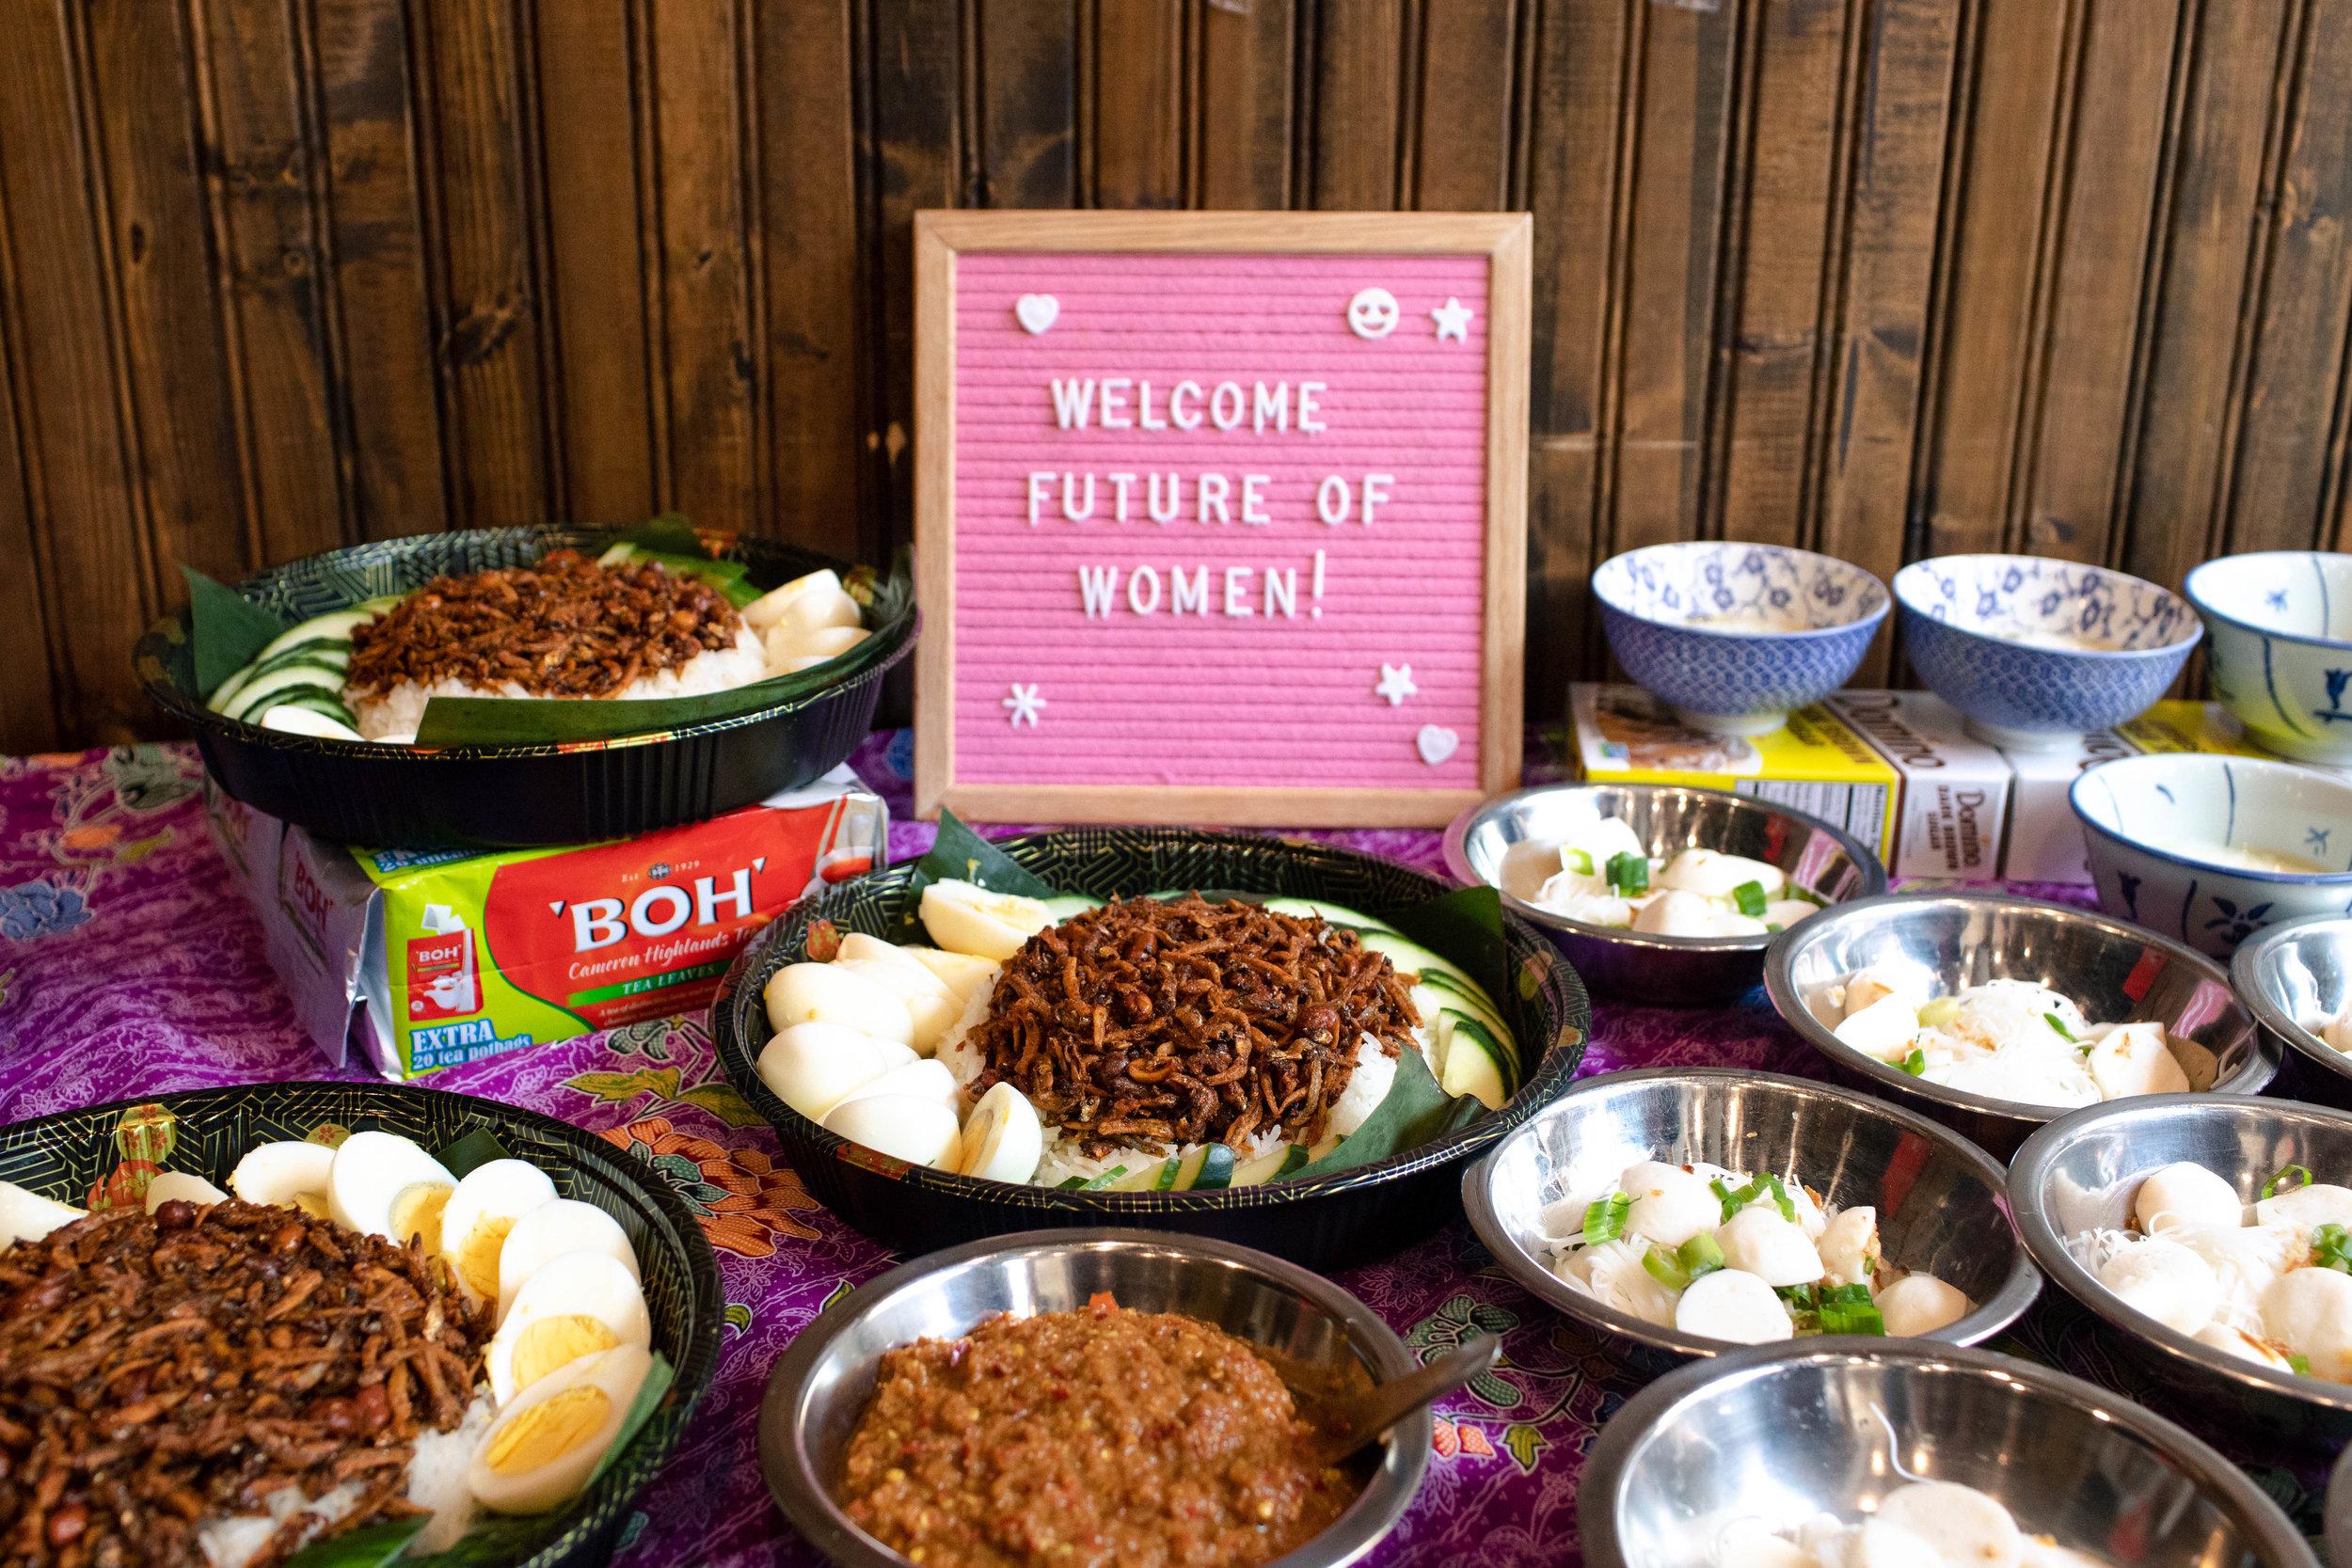 fow-kopitam-breakfast-elenamudd-2789.jpg